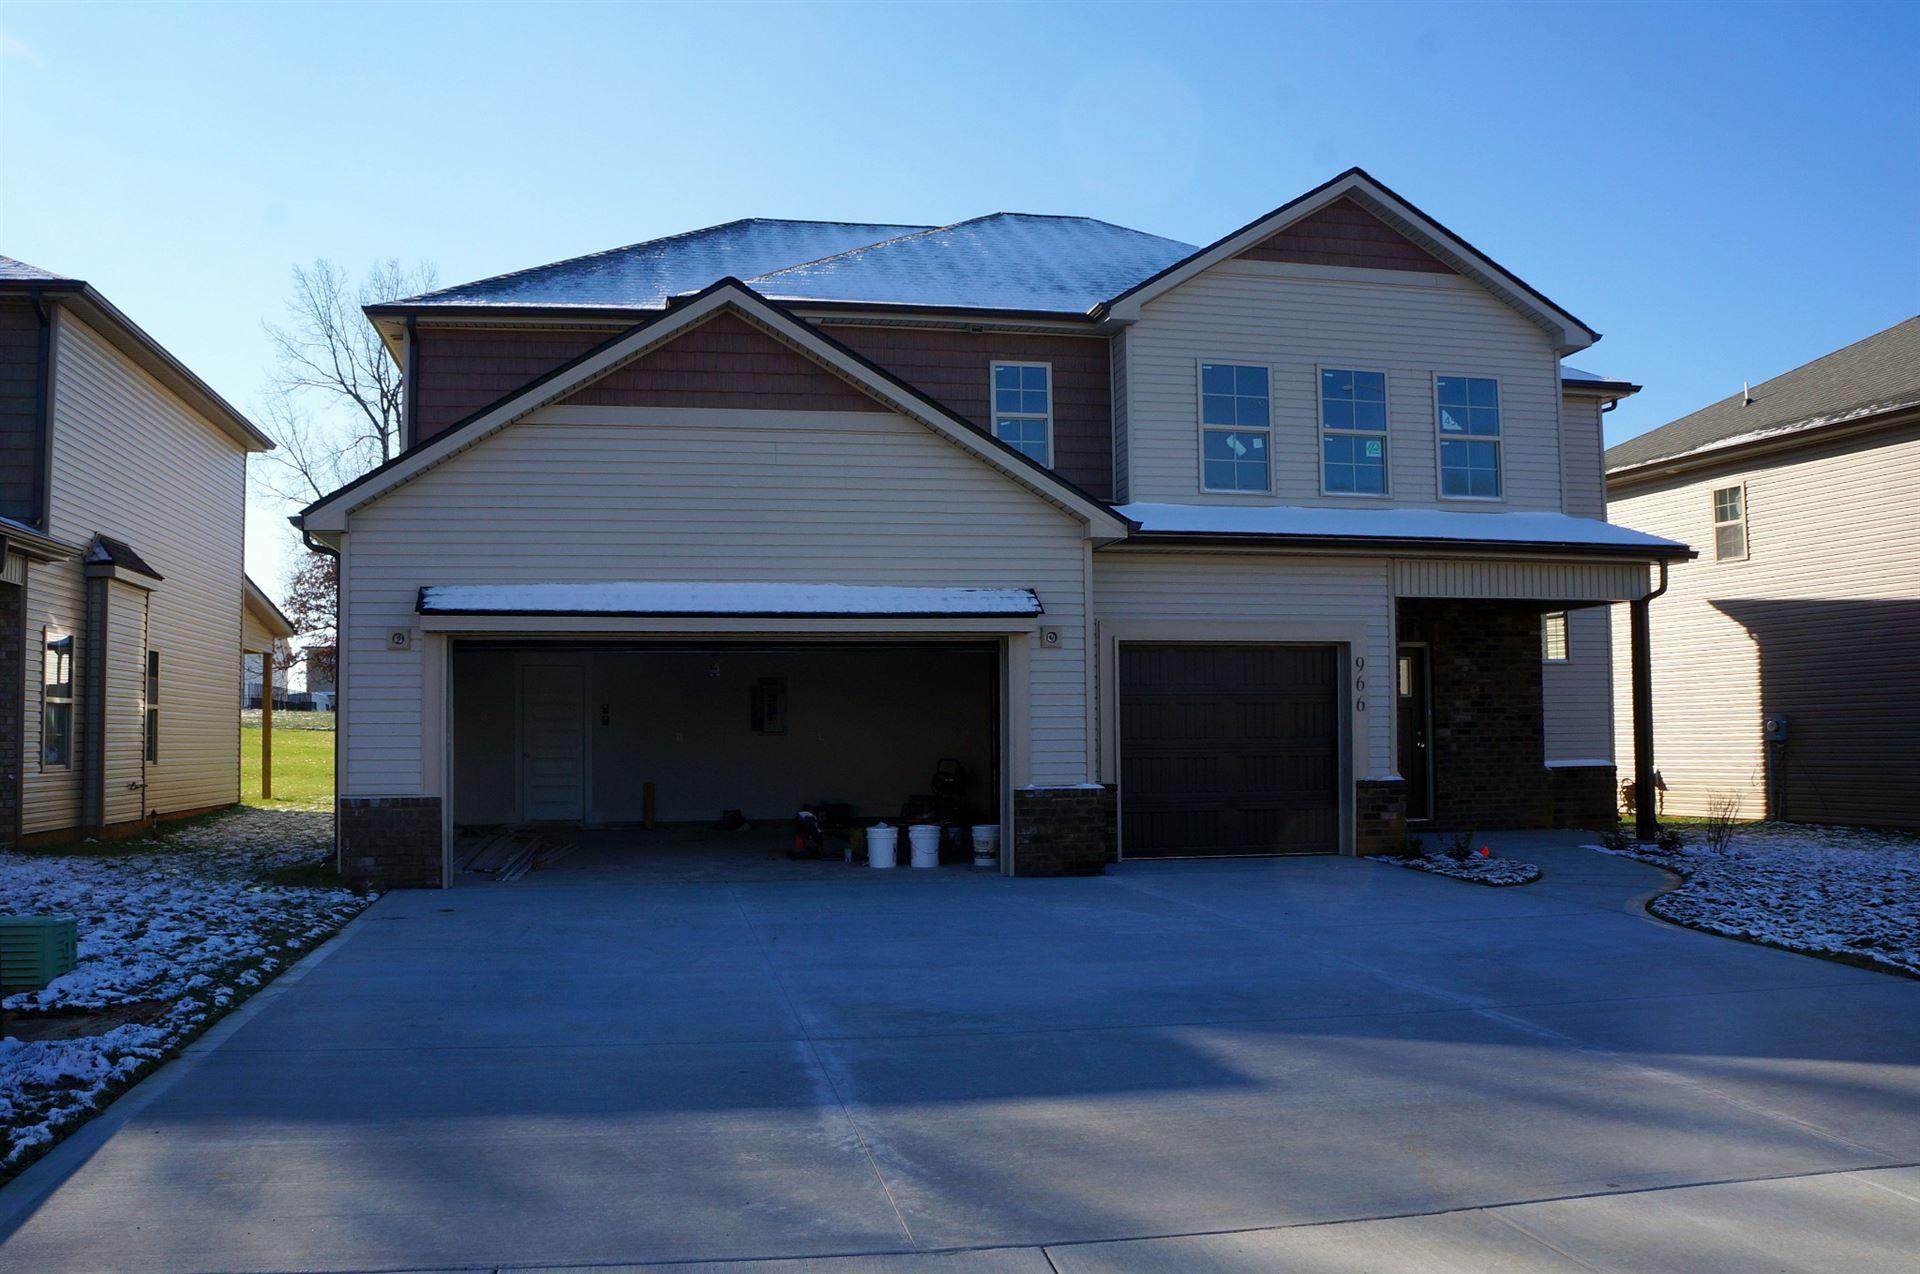 966 Cherry Blossom Ln, Clarksville, TN 37040 - MLS#: 2298116